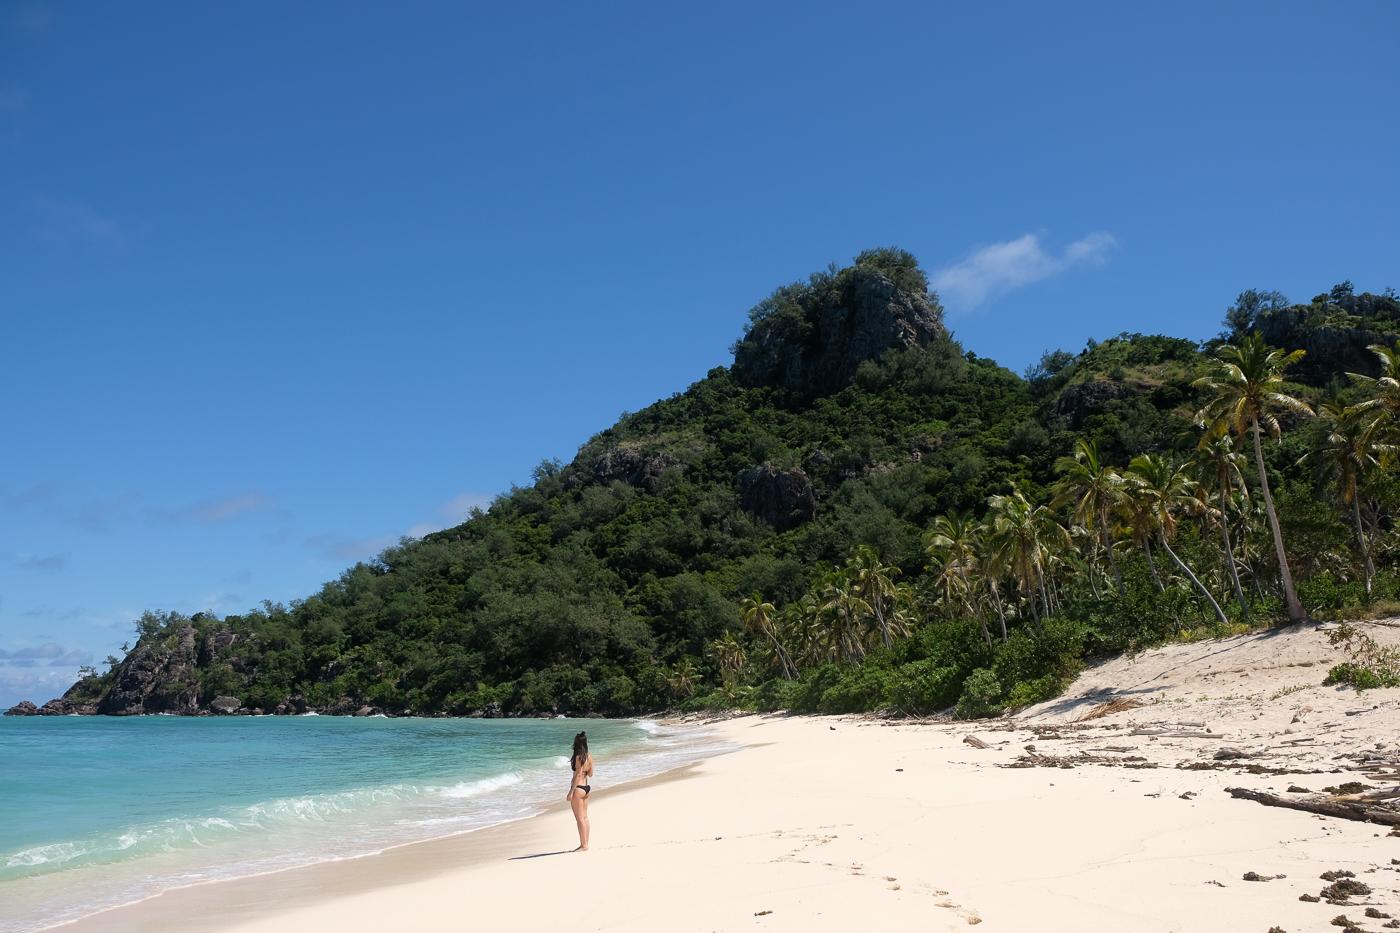 Catherine Benoit - The Go Fever - Voyag e aux îles Fidji